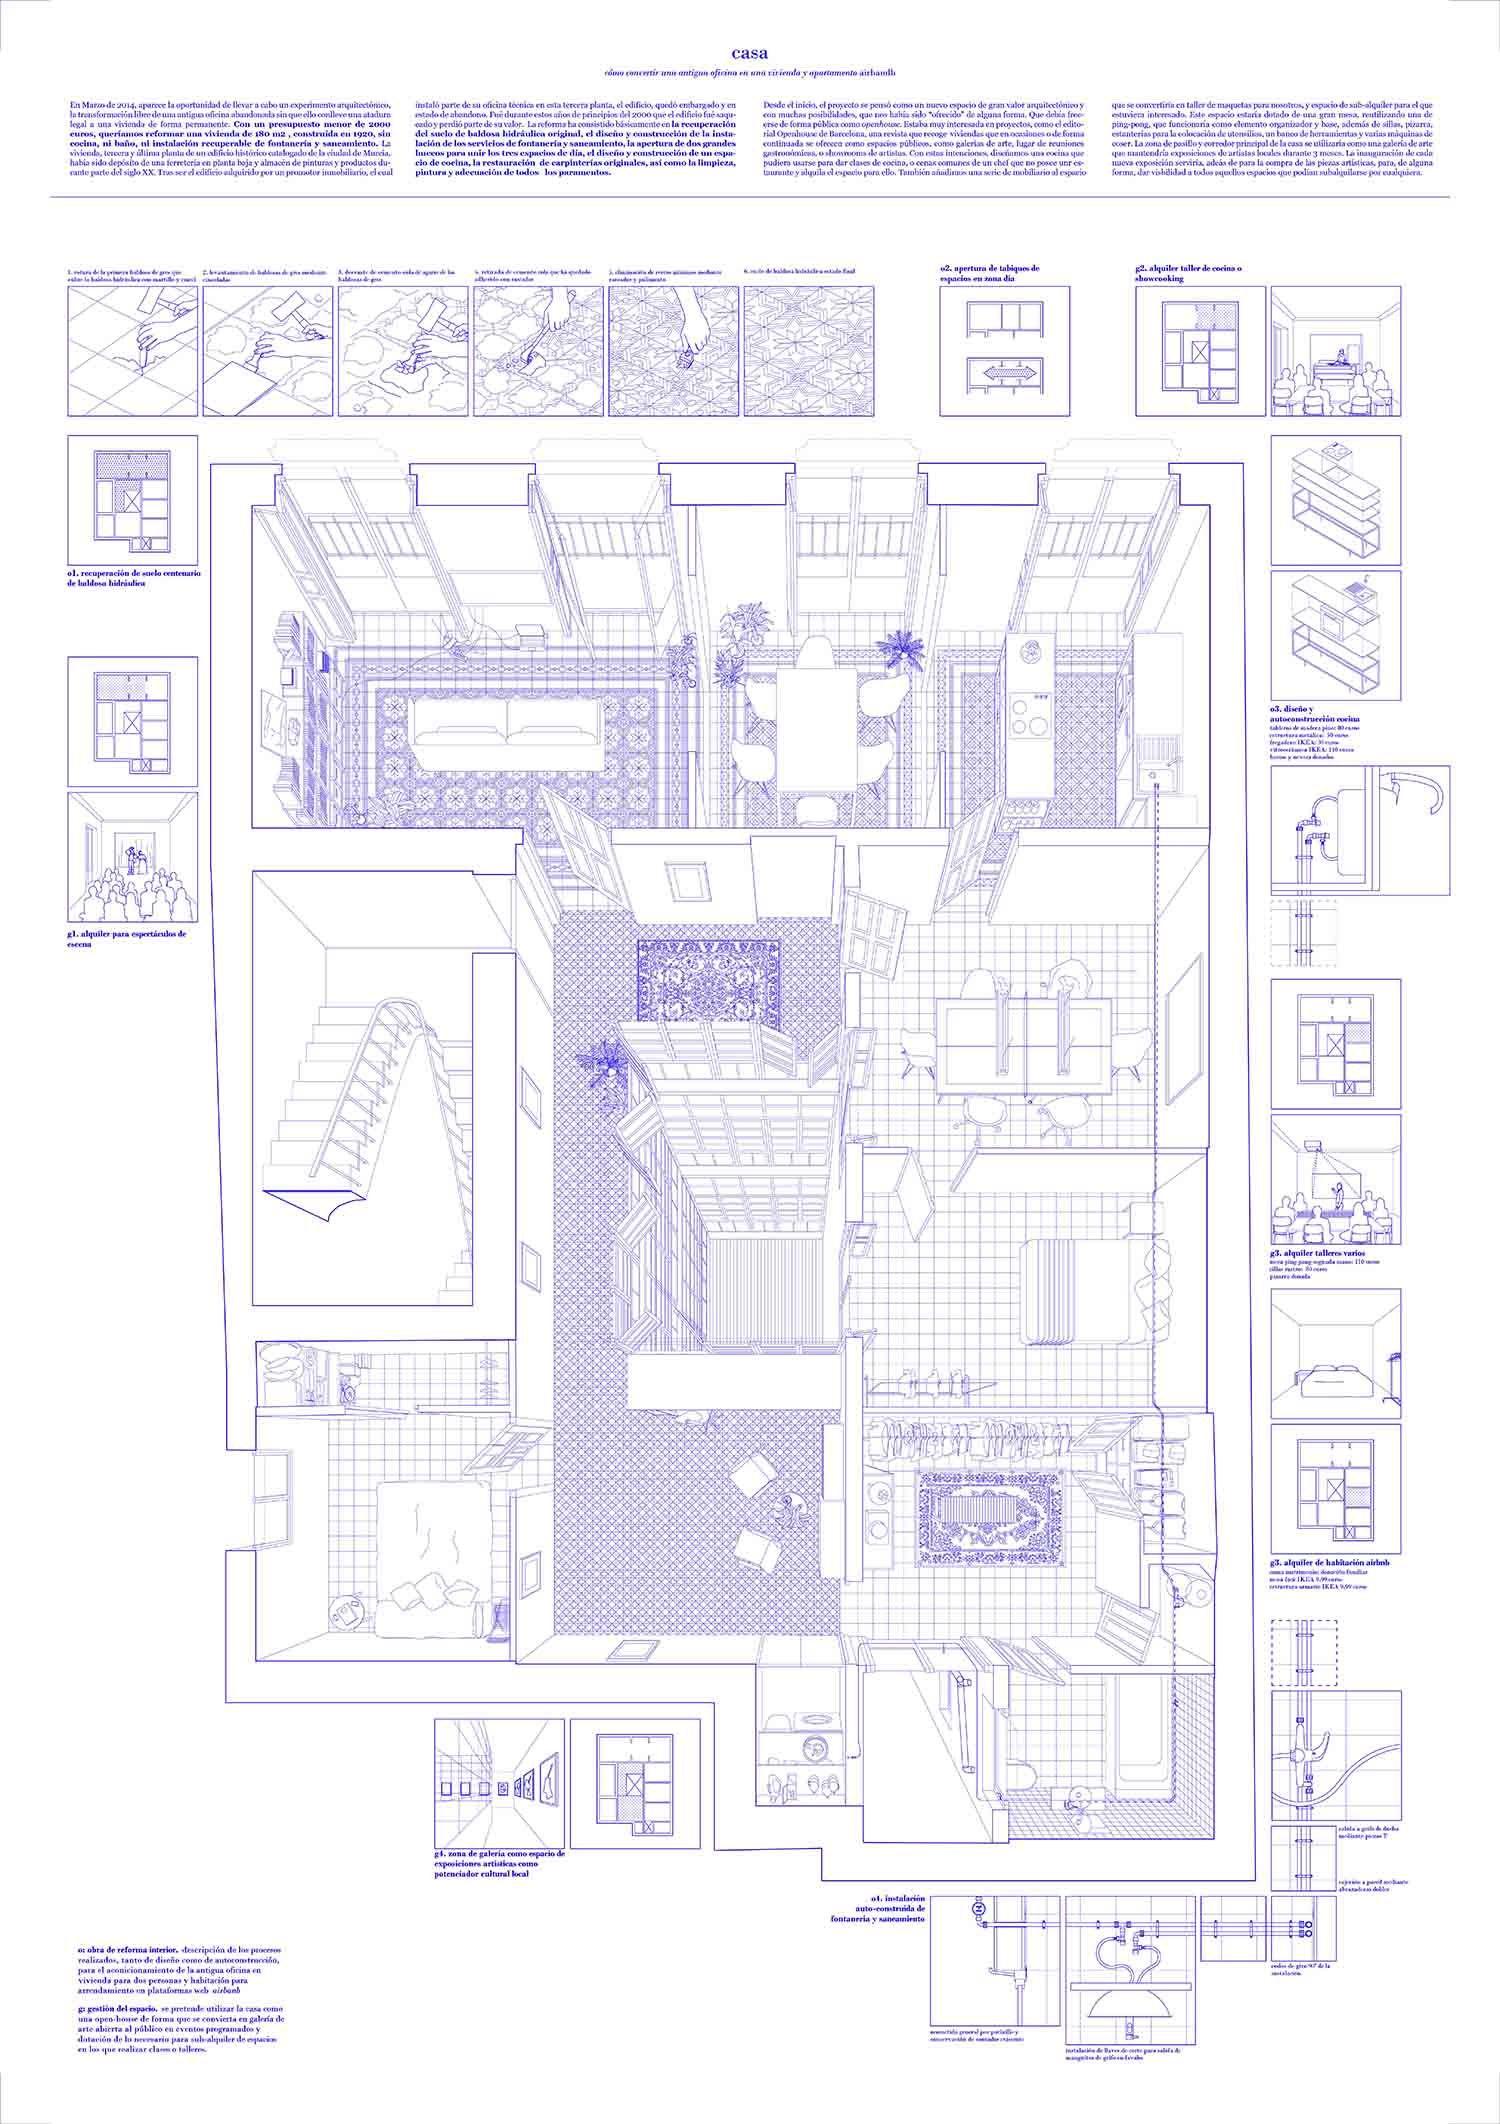 toyota estima hybrid wiring diagram #3 | Wiring diagrams for ...